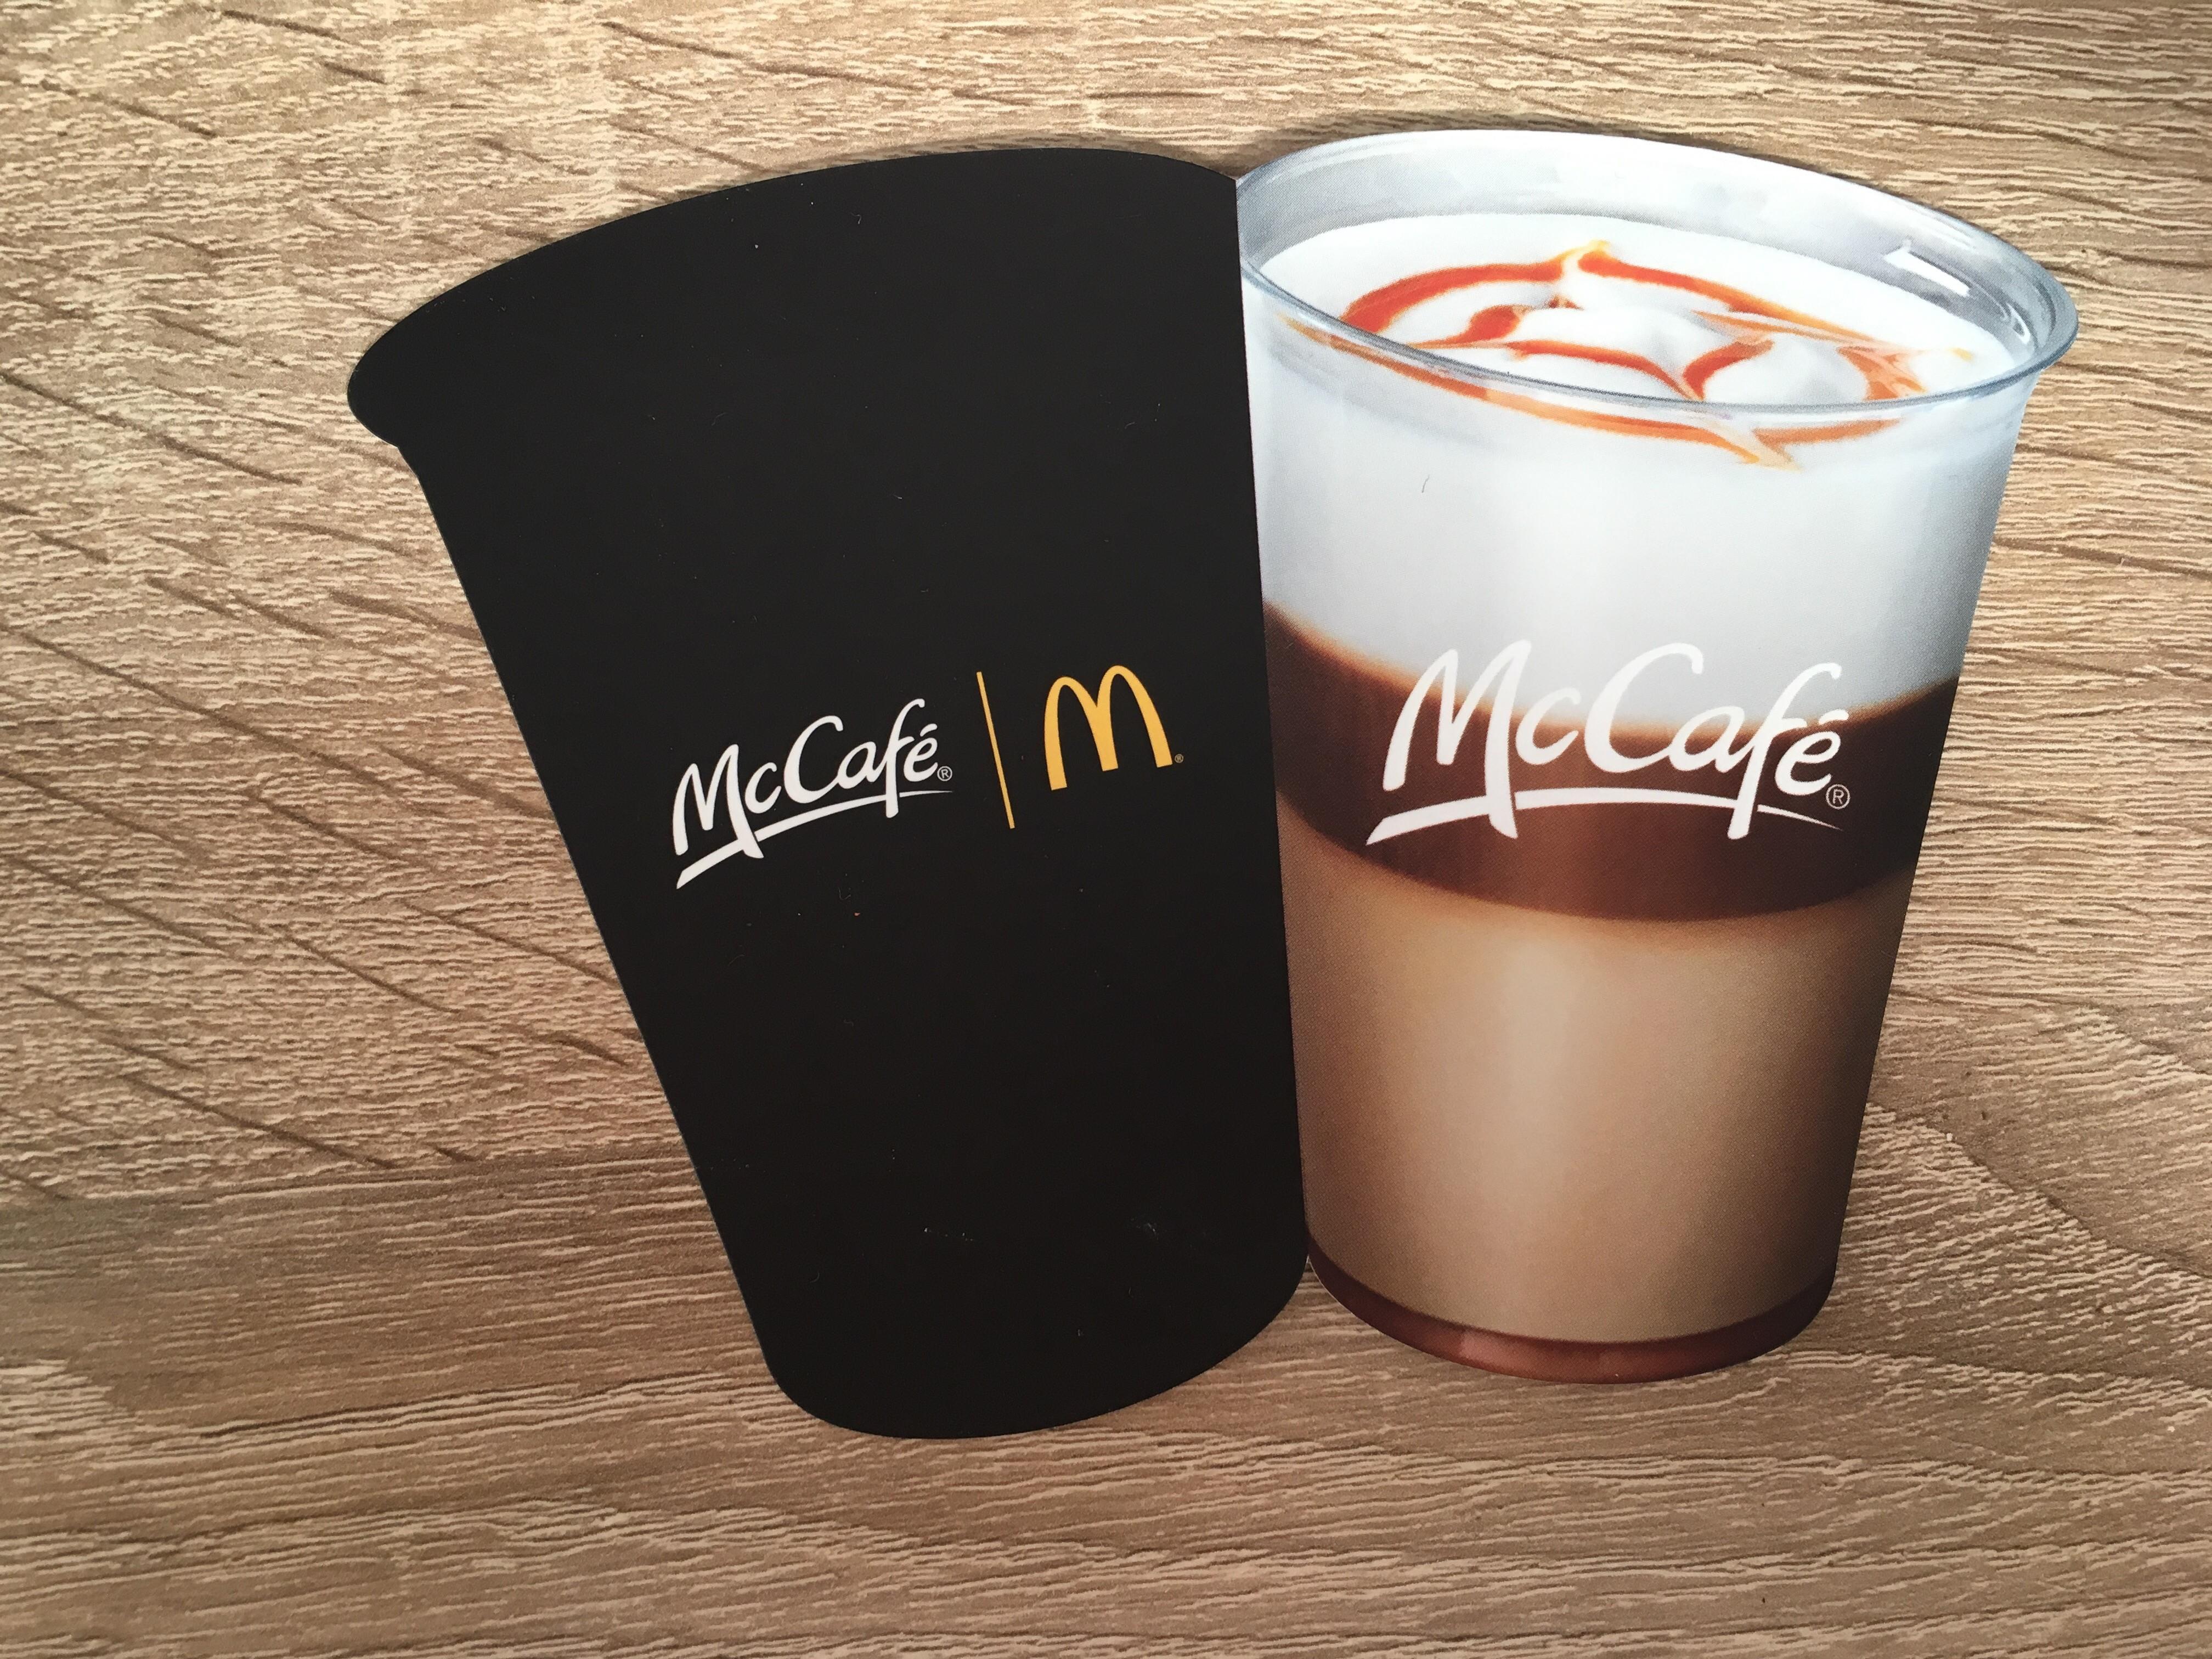 McCafe warm drankje voor € 1,-